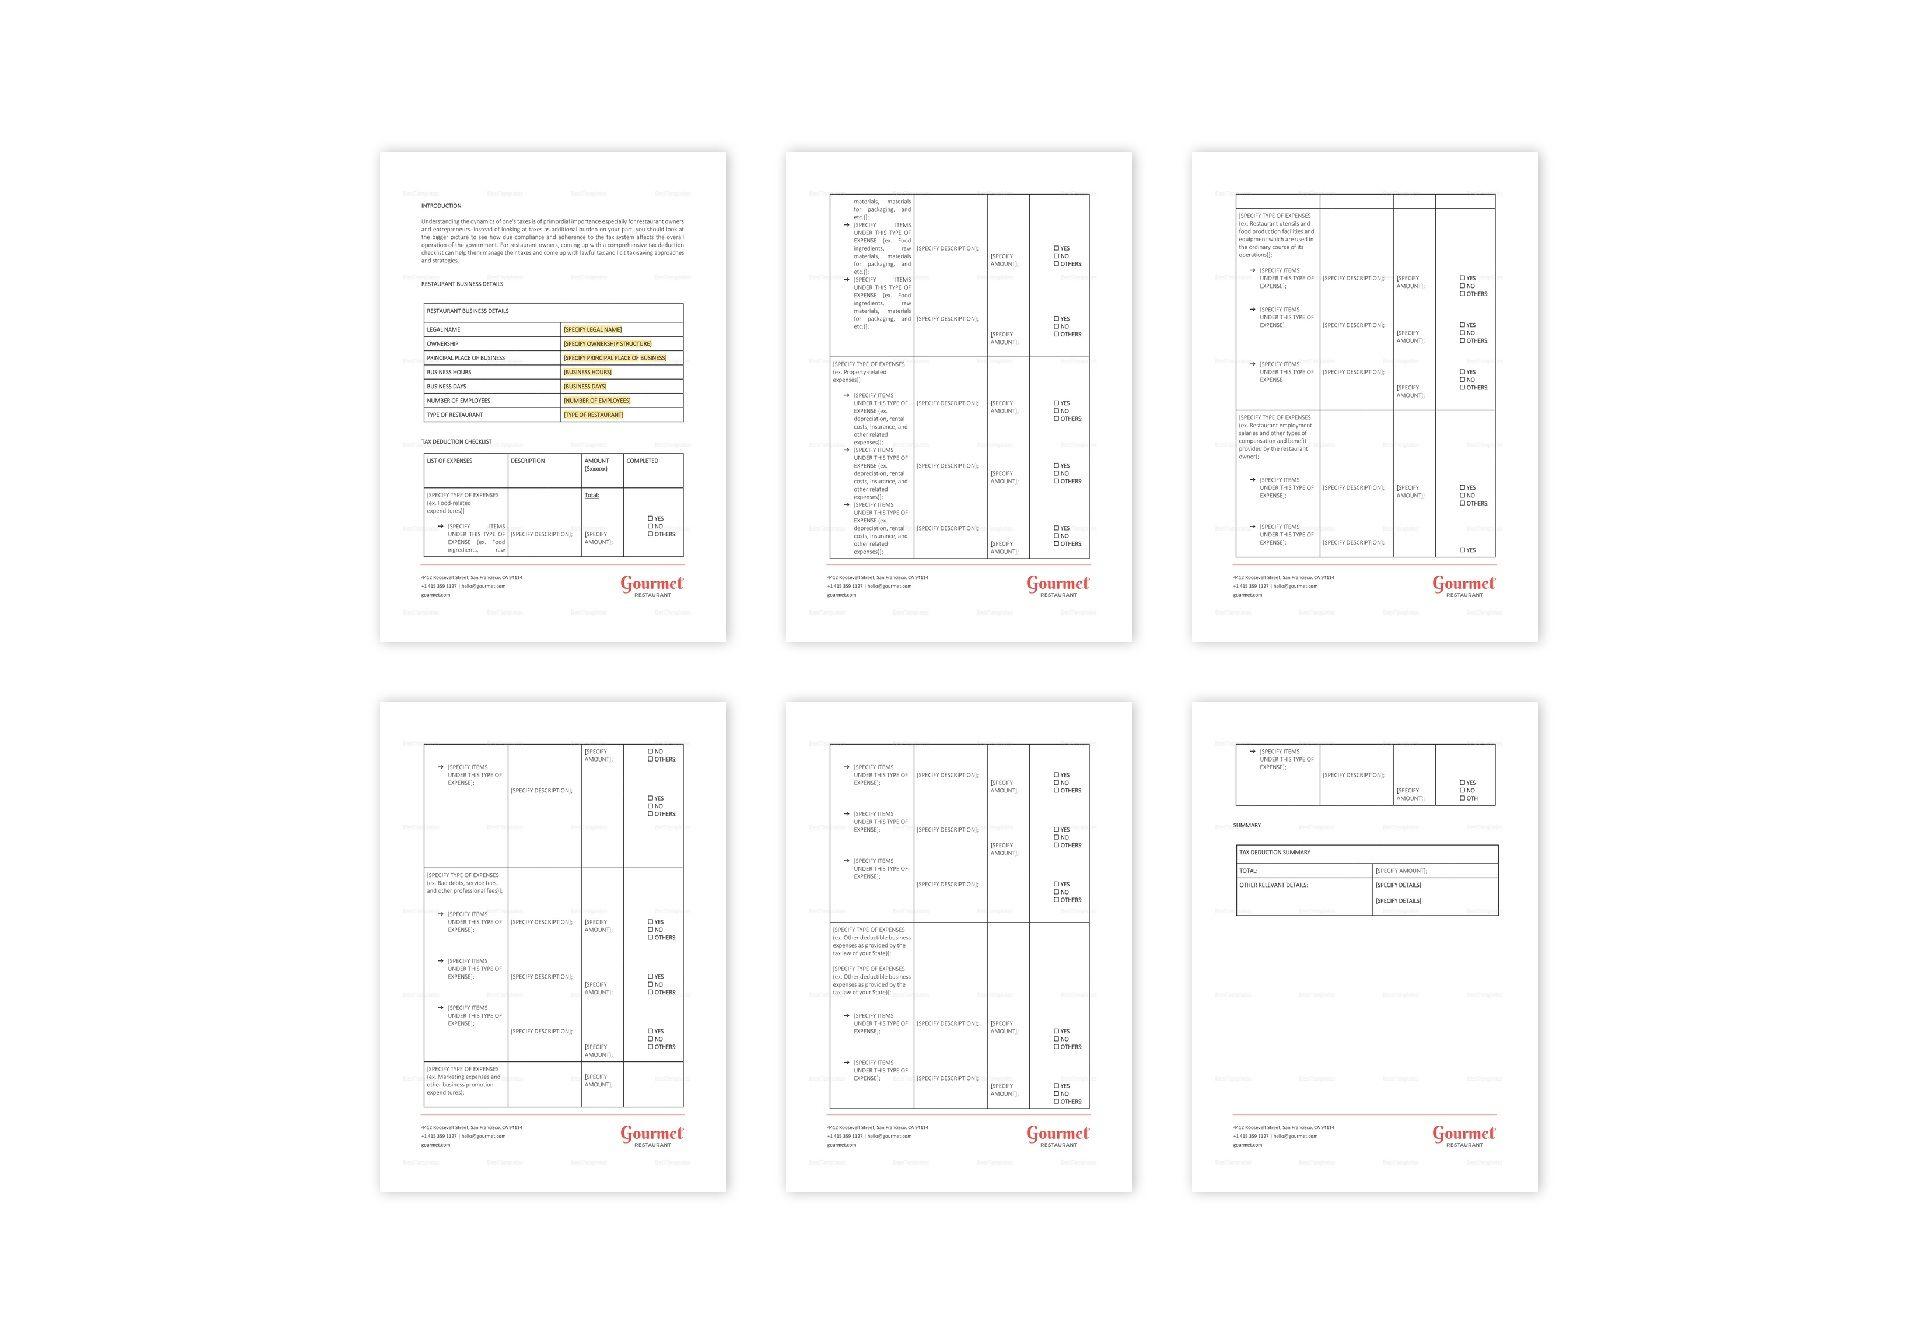 Restaurant Tax Deduction Checklist Template in Word, Apple